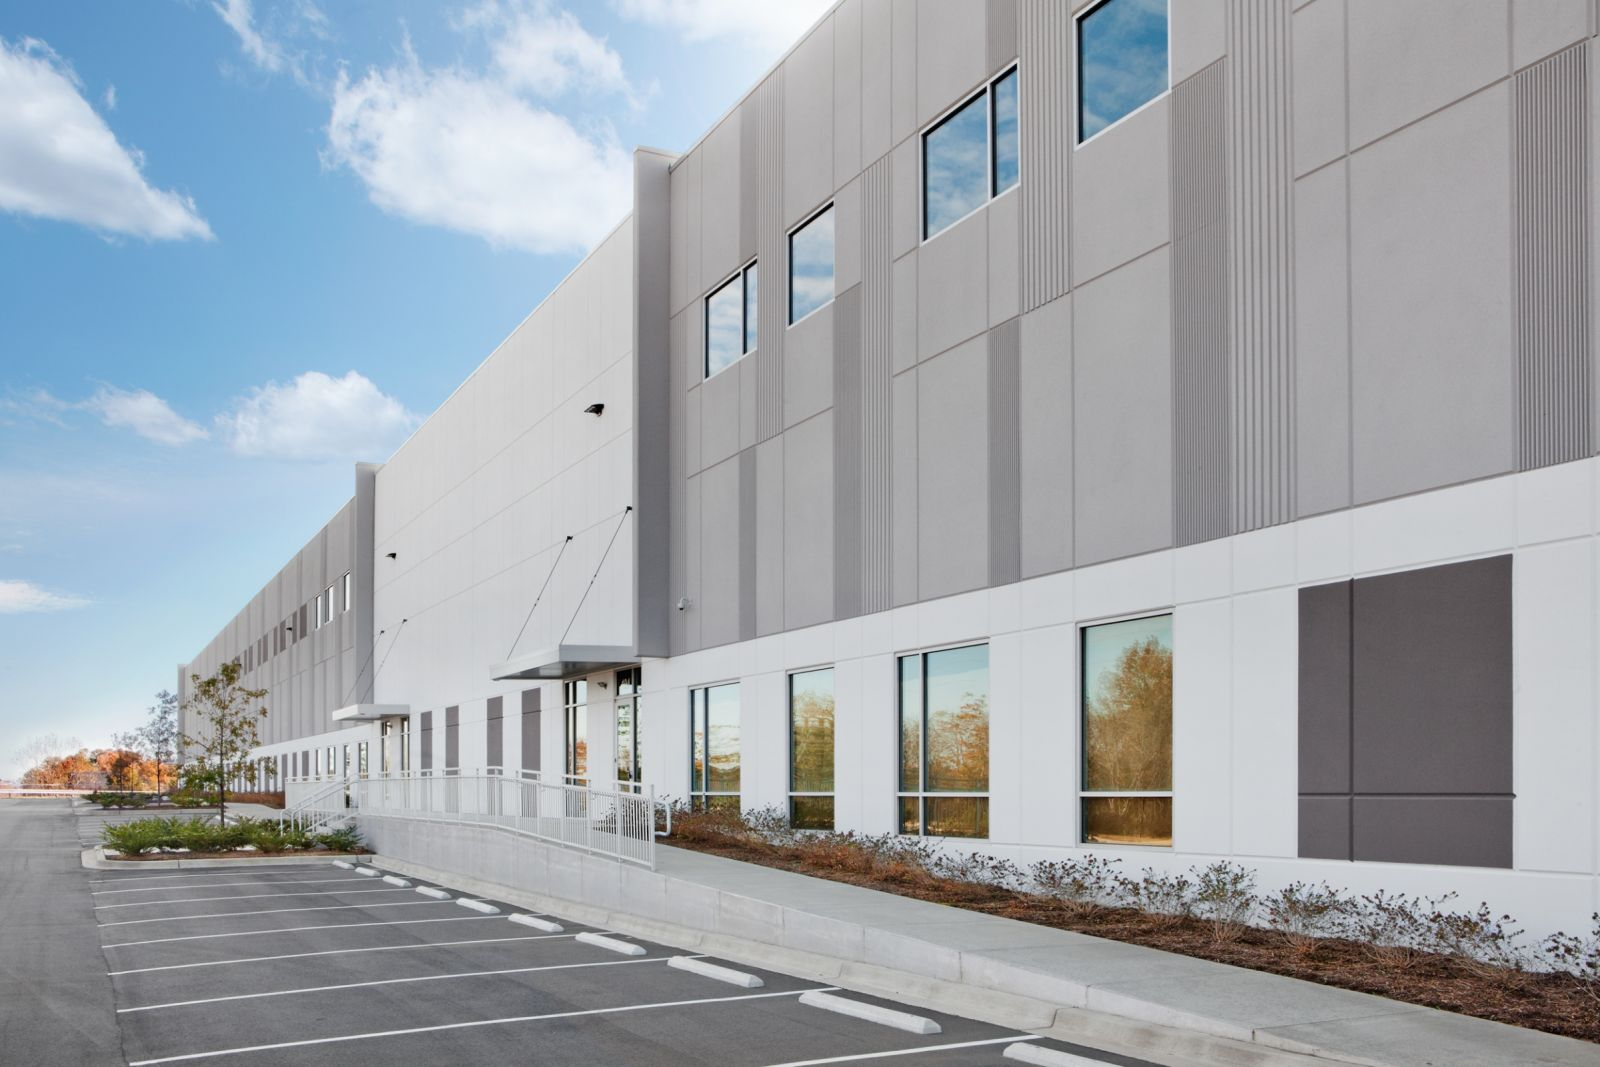 Architecture firms charlotte nc interior design merriman - Interior design firms in charlotte nc ...